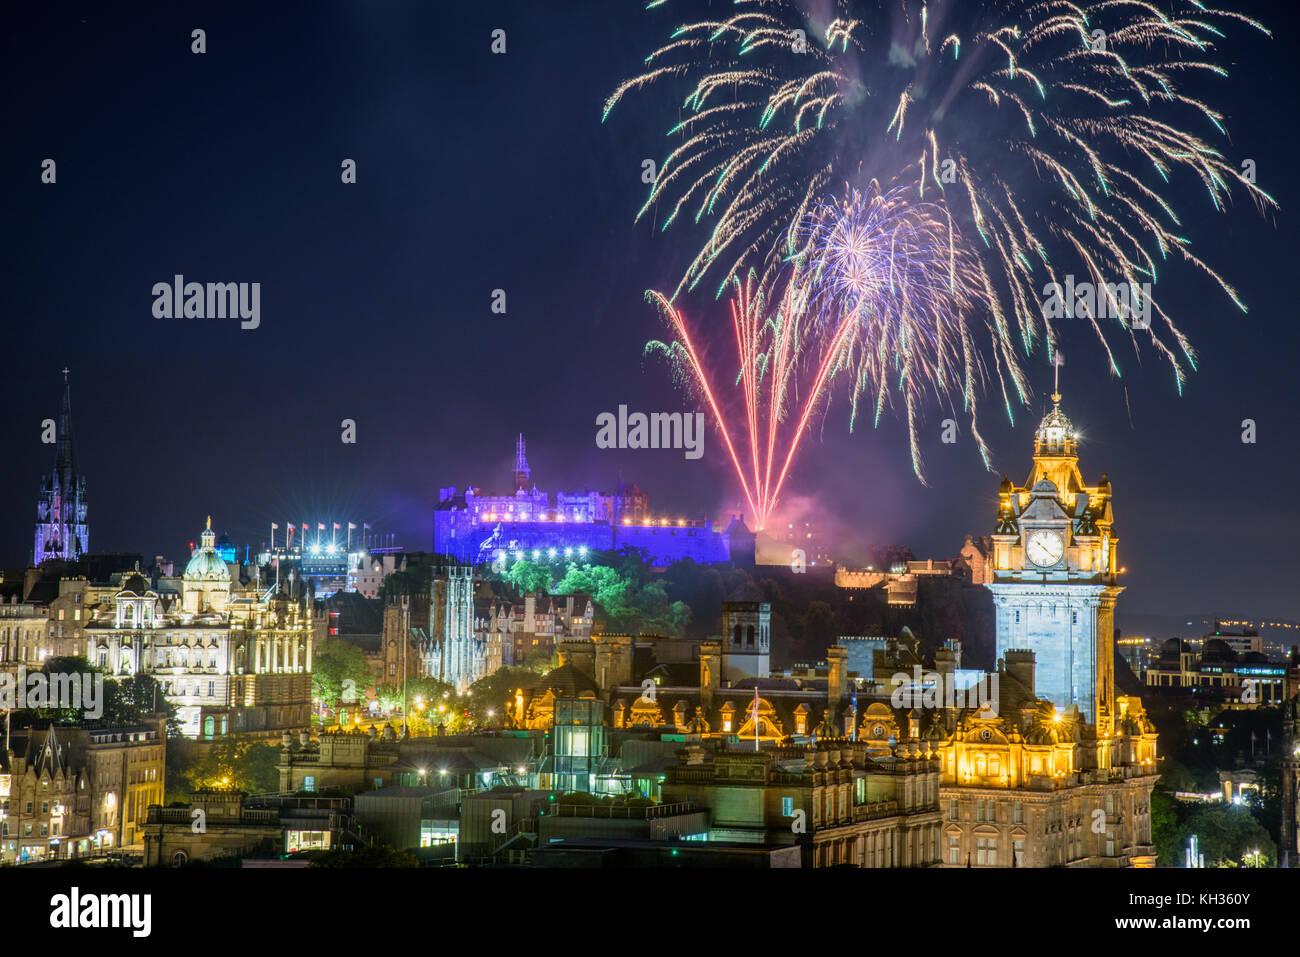 EDINBURGH, SCOTLAND - AUGUST 15, 2017 - The scenic summer fireworks in Edinburgh during the Royal Military Tattoo Stock Photo